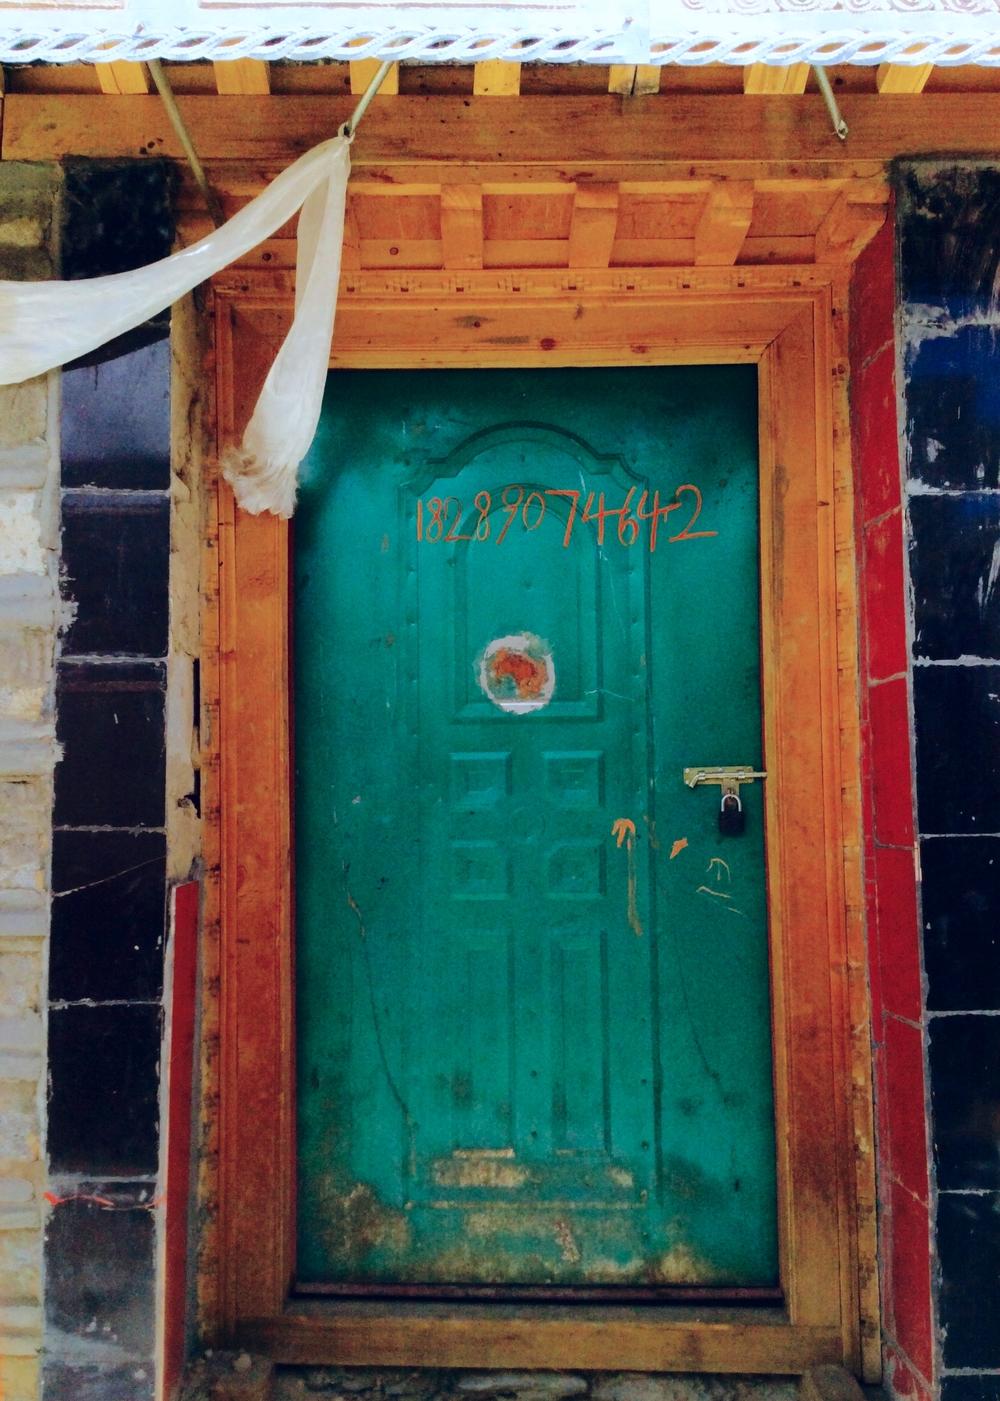 Green Door with Kata, Drakda